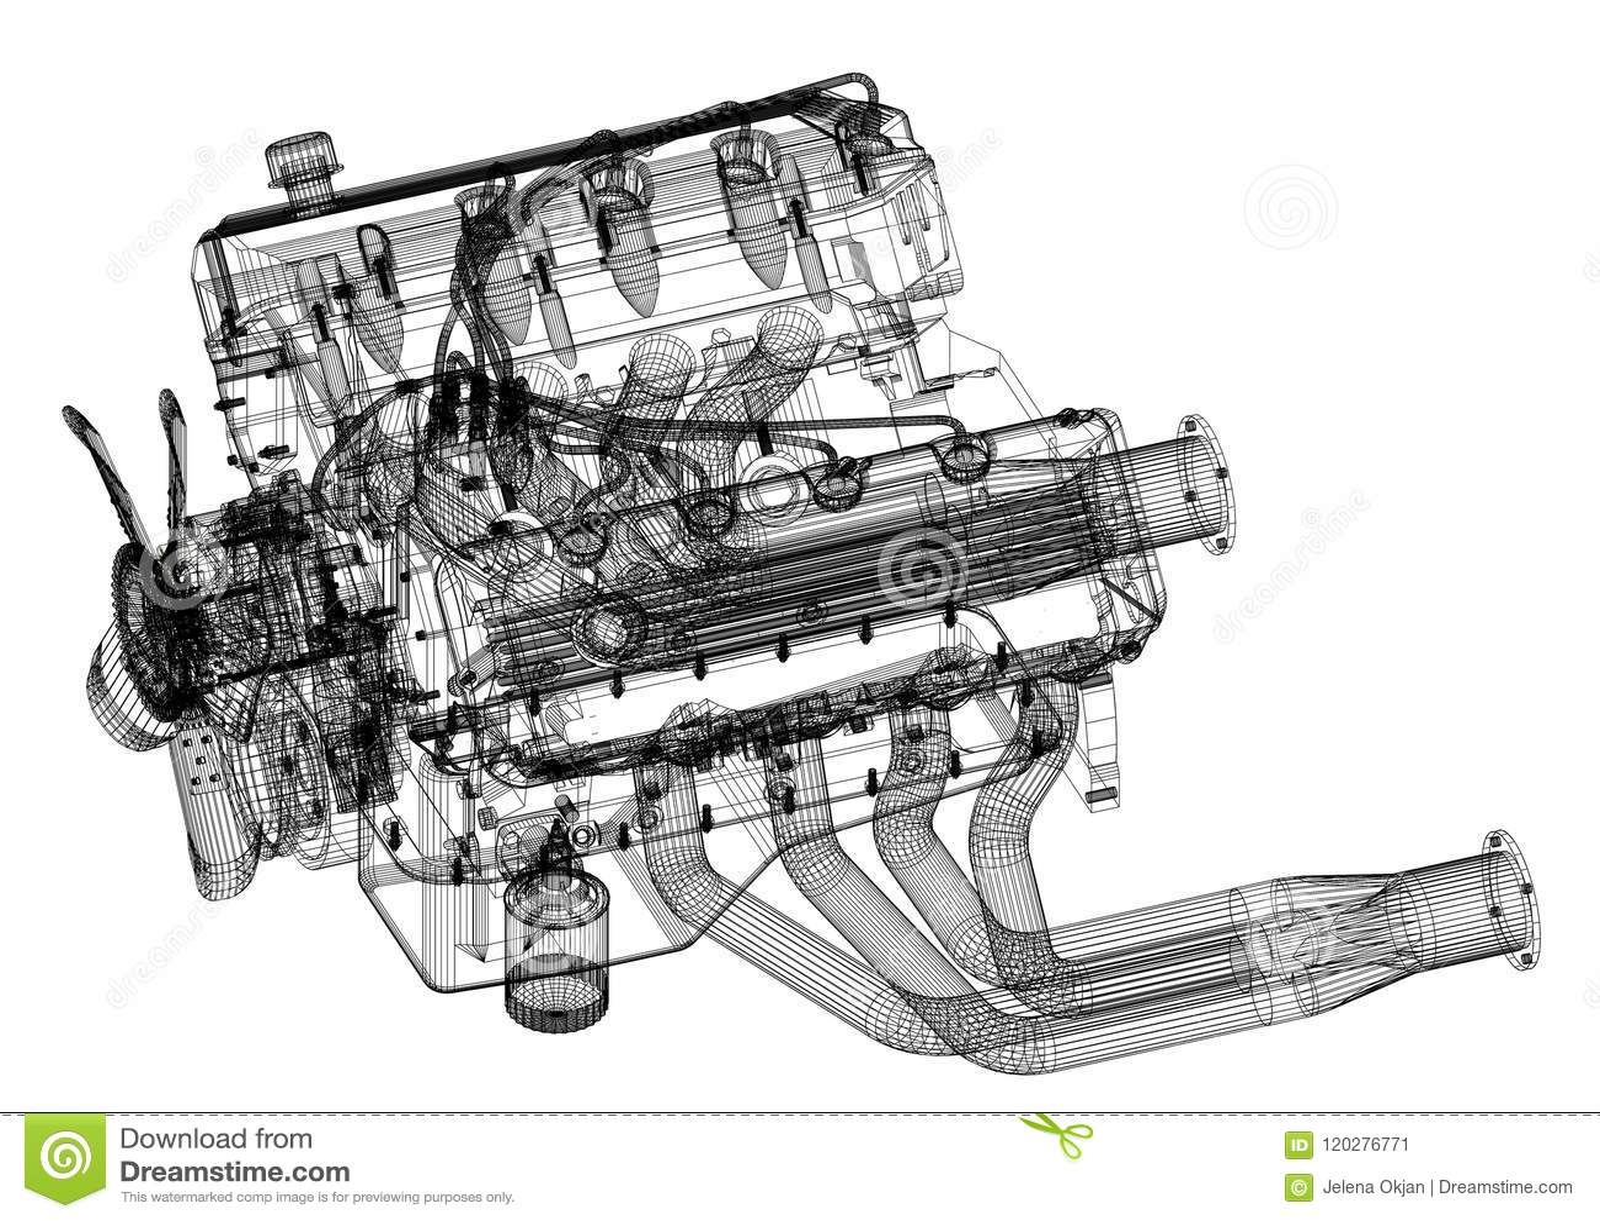 Gm Corvette Crate Engine